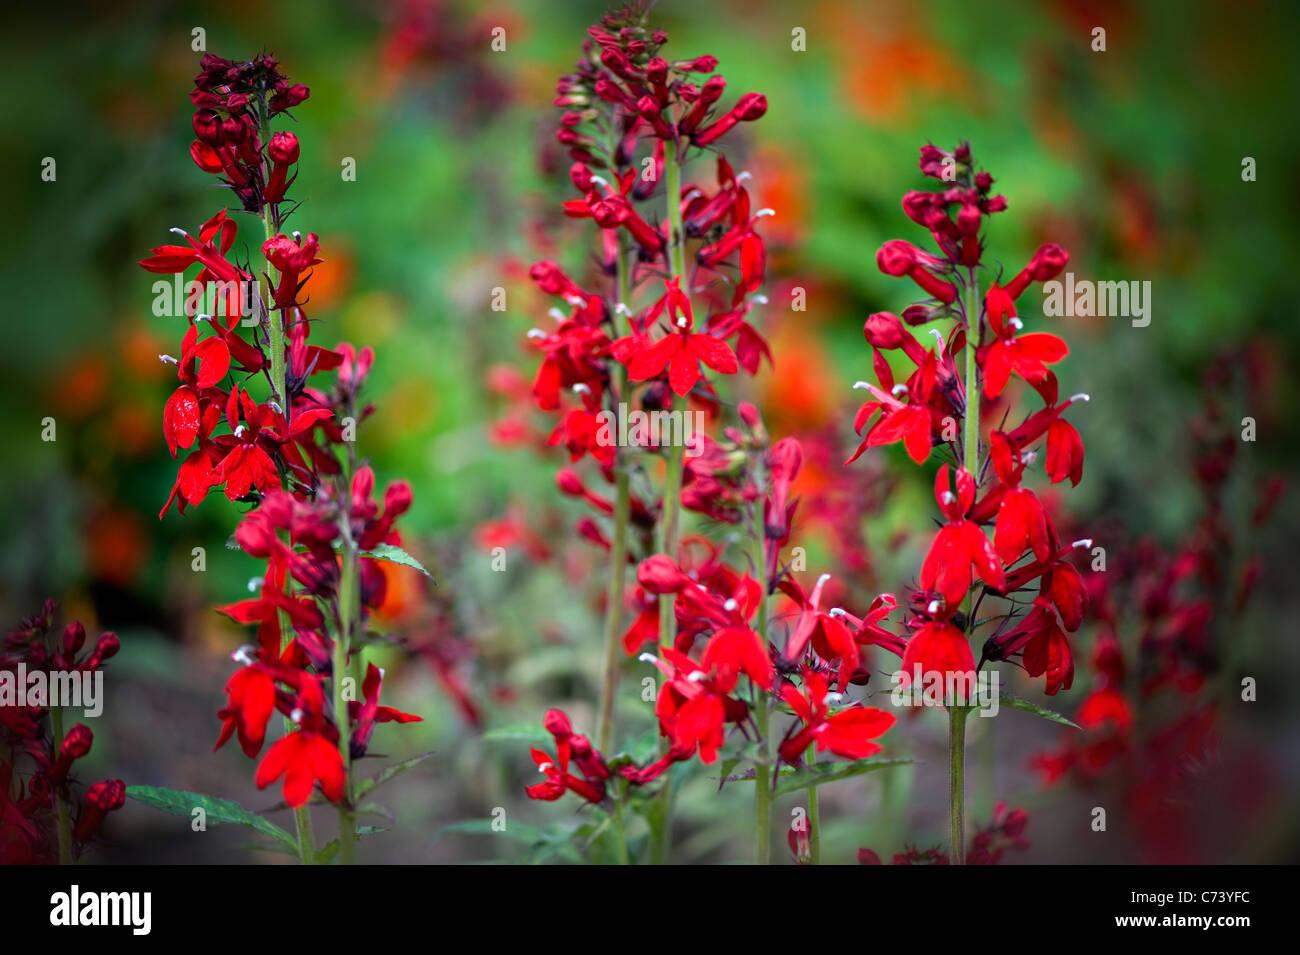 Close Up Image Of Lobelia Compliment Scarlet Cardinal Red